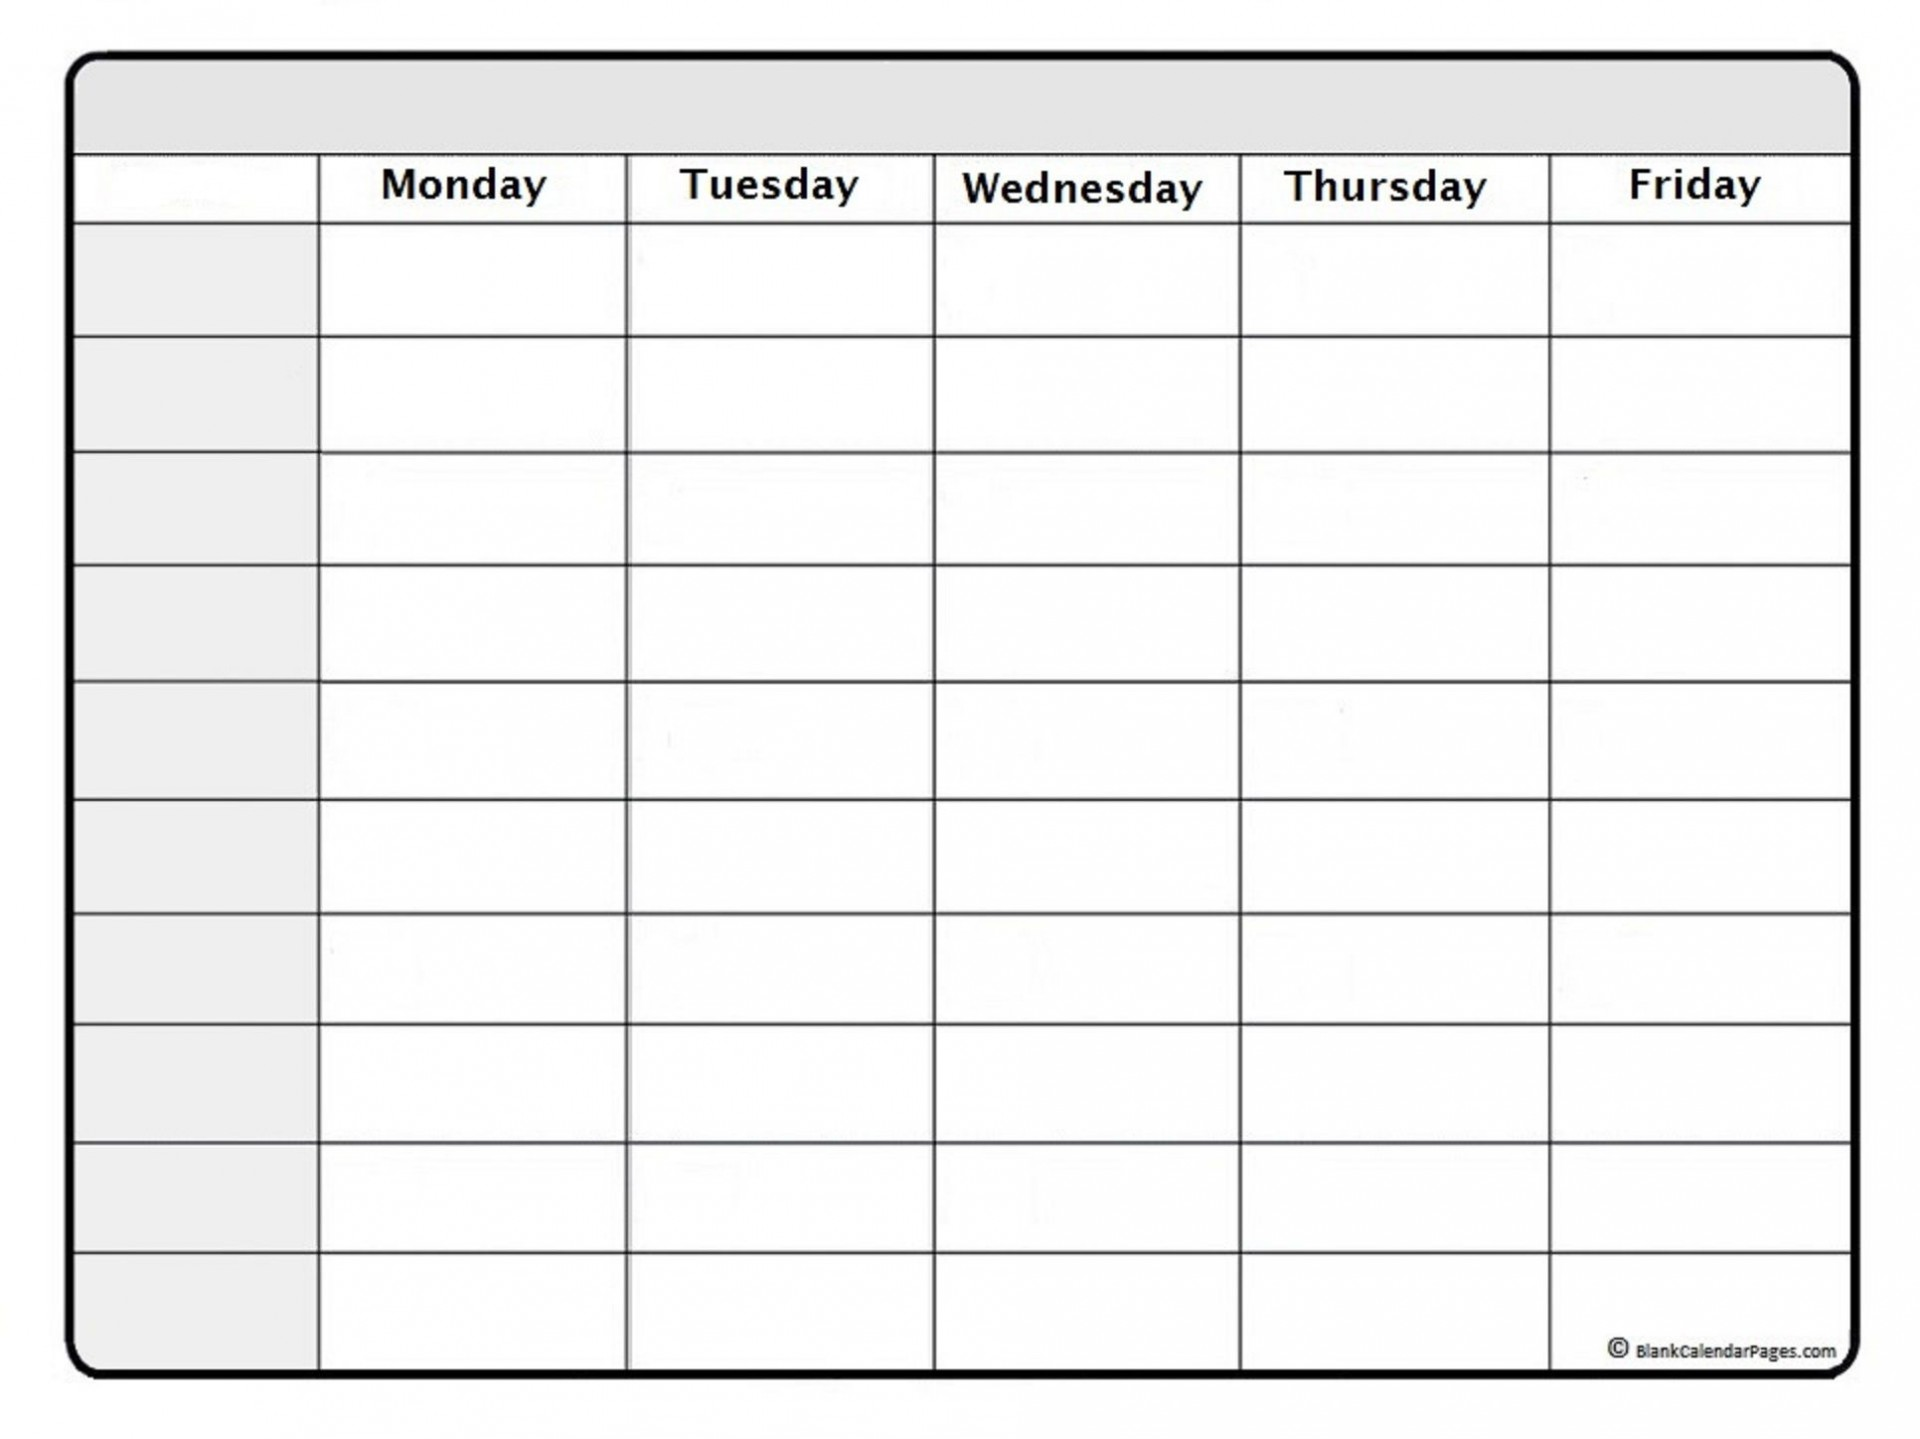 001 Breathtaking Weekly Calendar Template 2020 Highest Clarity  Printable Blank Free1920